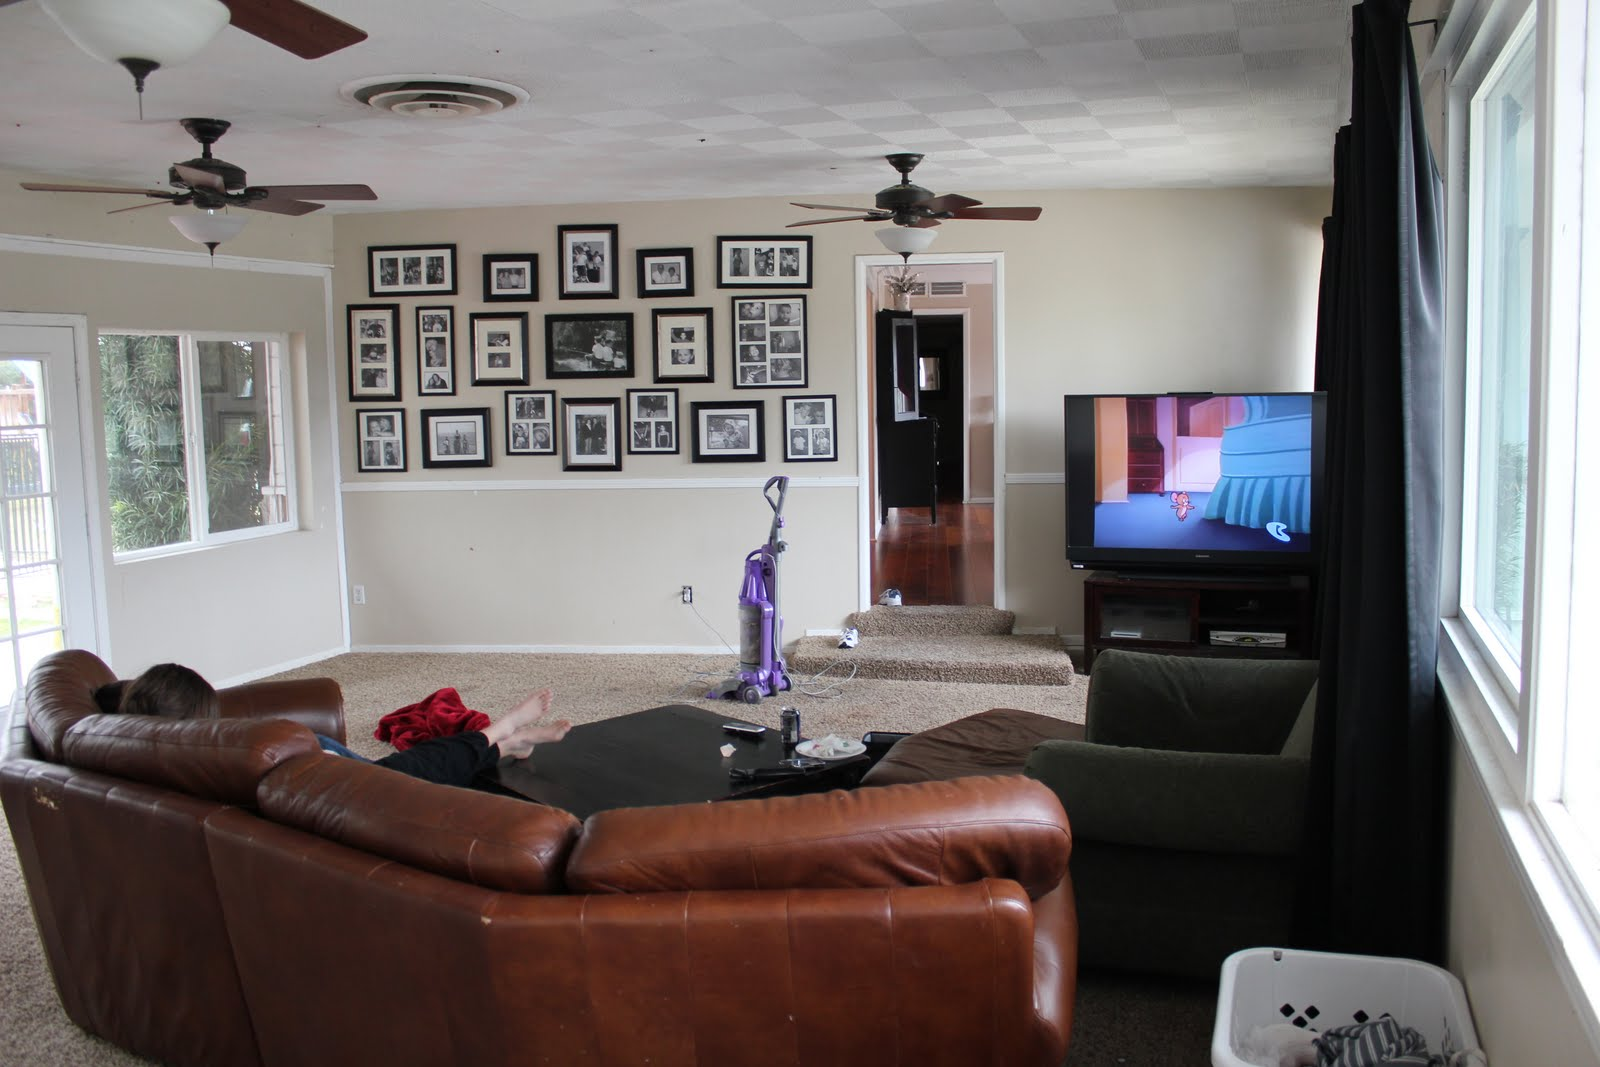 living room renovation. Living Room Renovation With DIY Entertainment Center for Flat Screen TV Remodelaholic